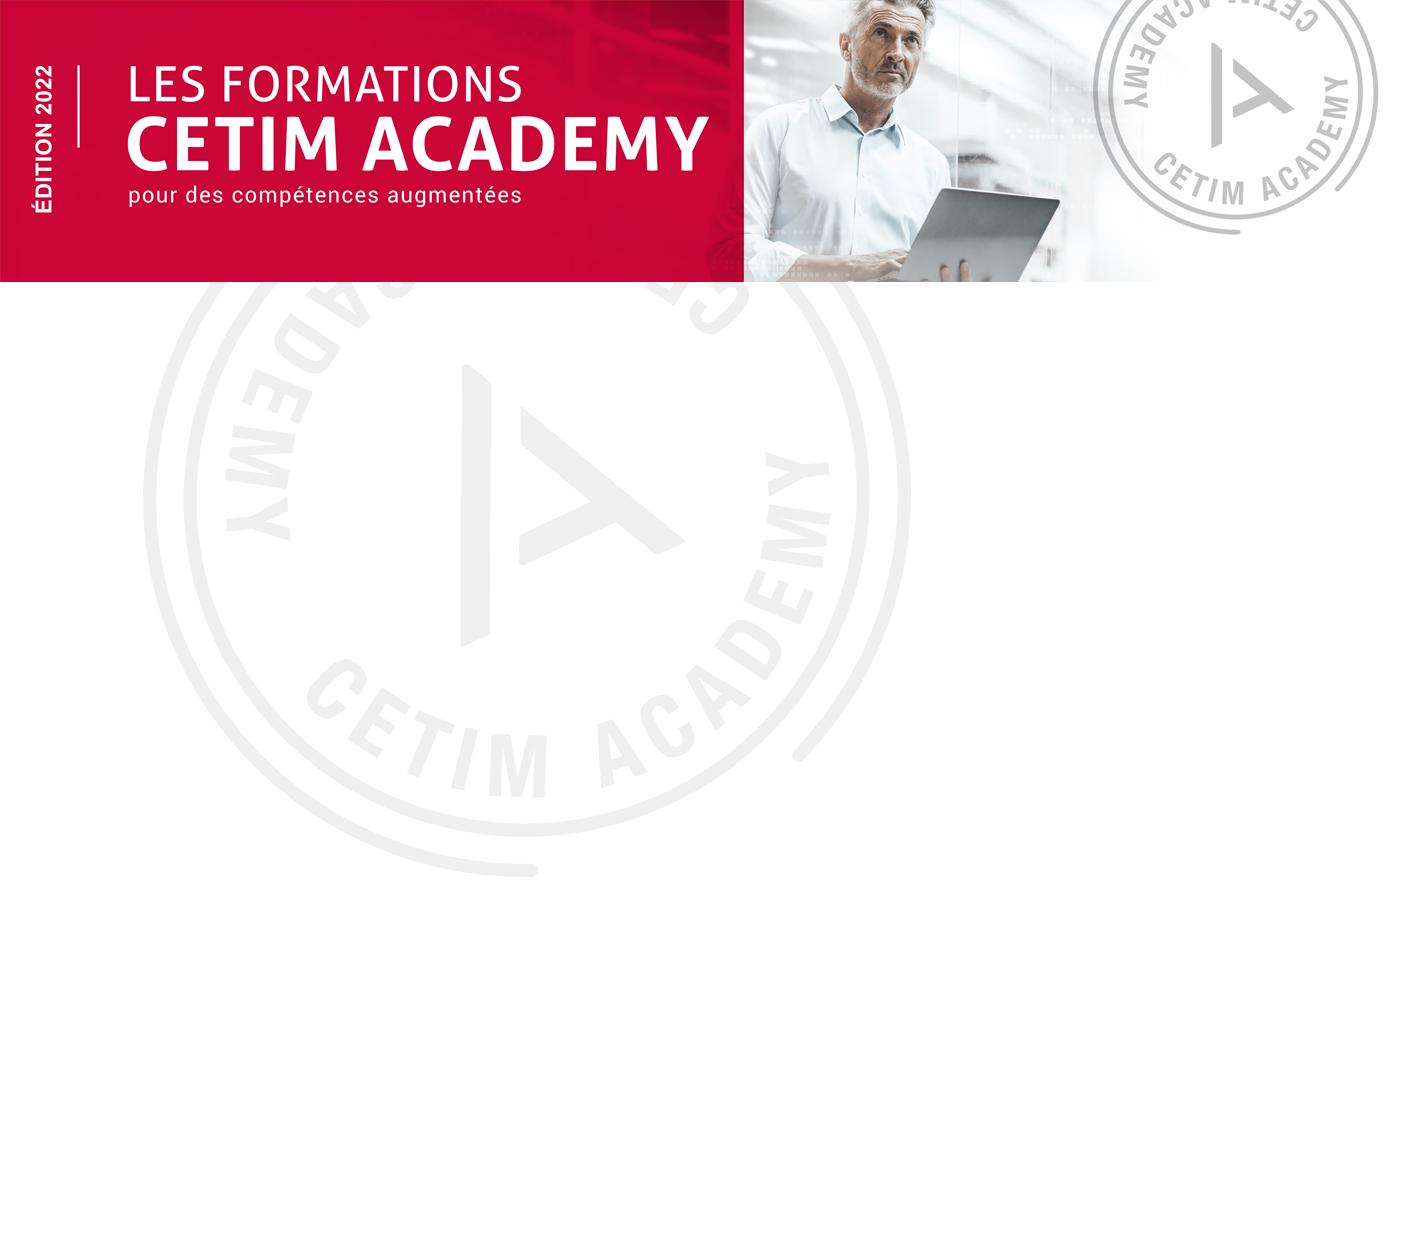 Cetim catalogue Formations 2022